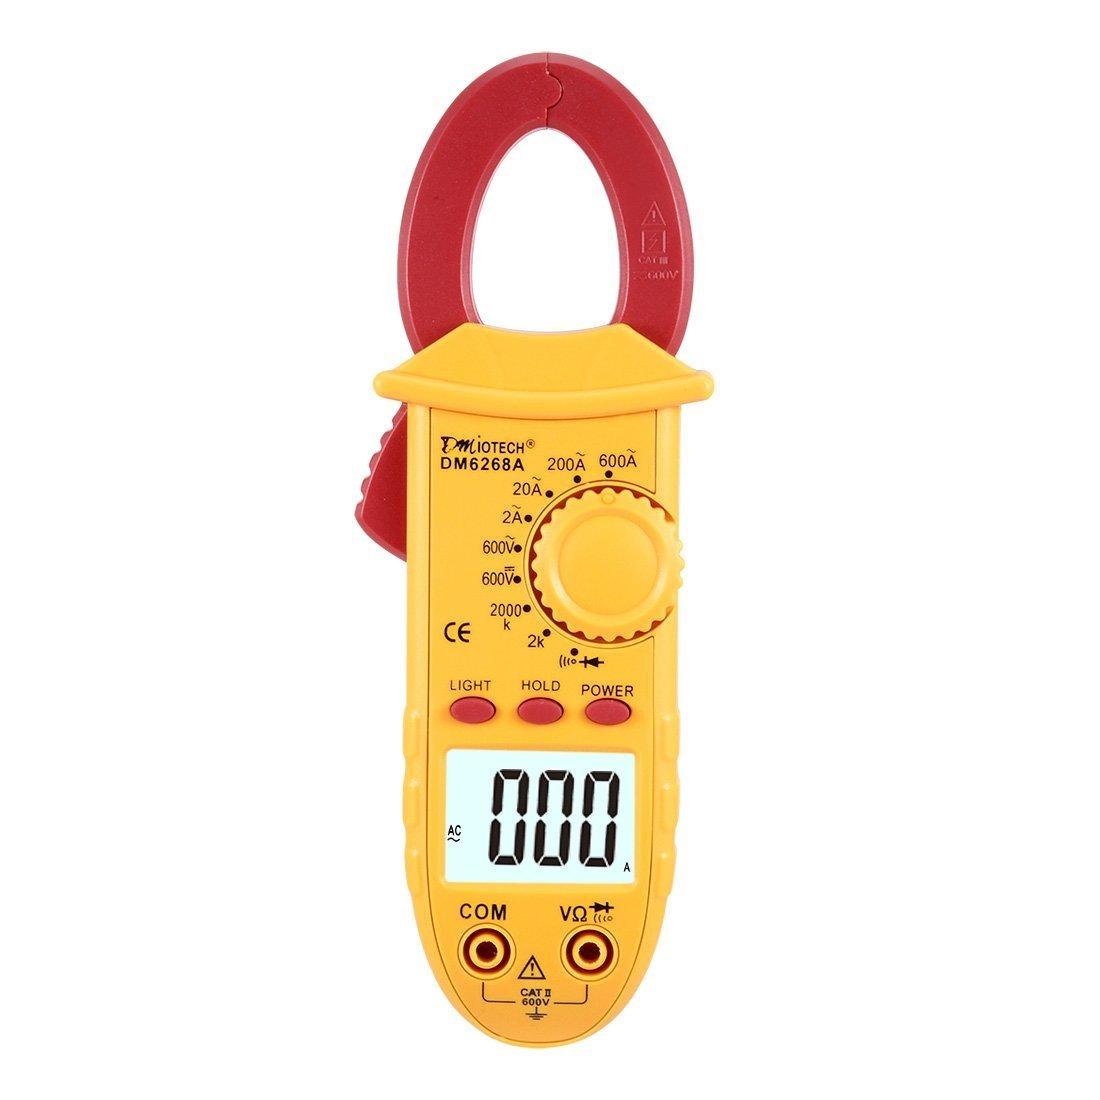 sourcingmap® Mini Digital Multimeter Ammeter Current AC/DC Voltage Ohm Resistance Clamp Meter Tester Handheld a16072000ux0139